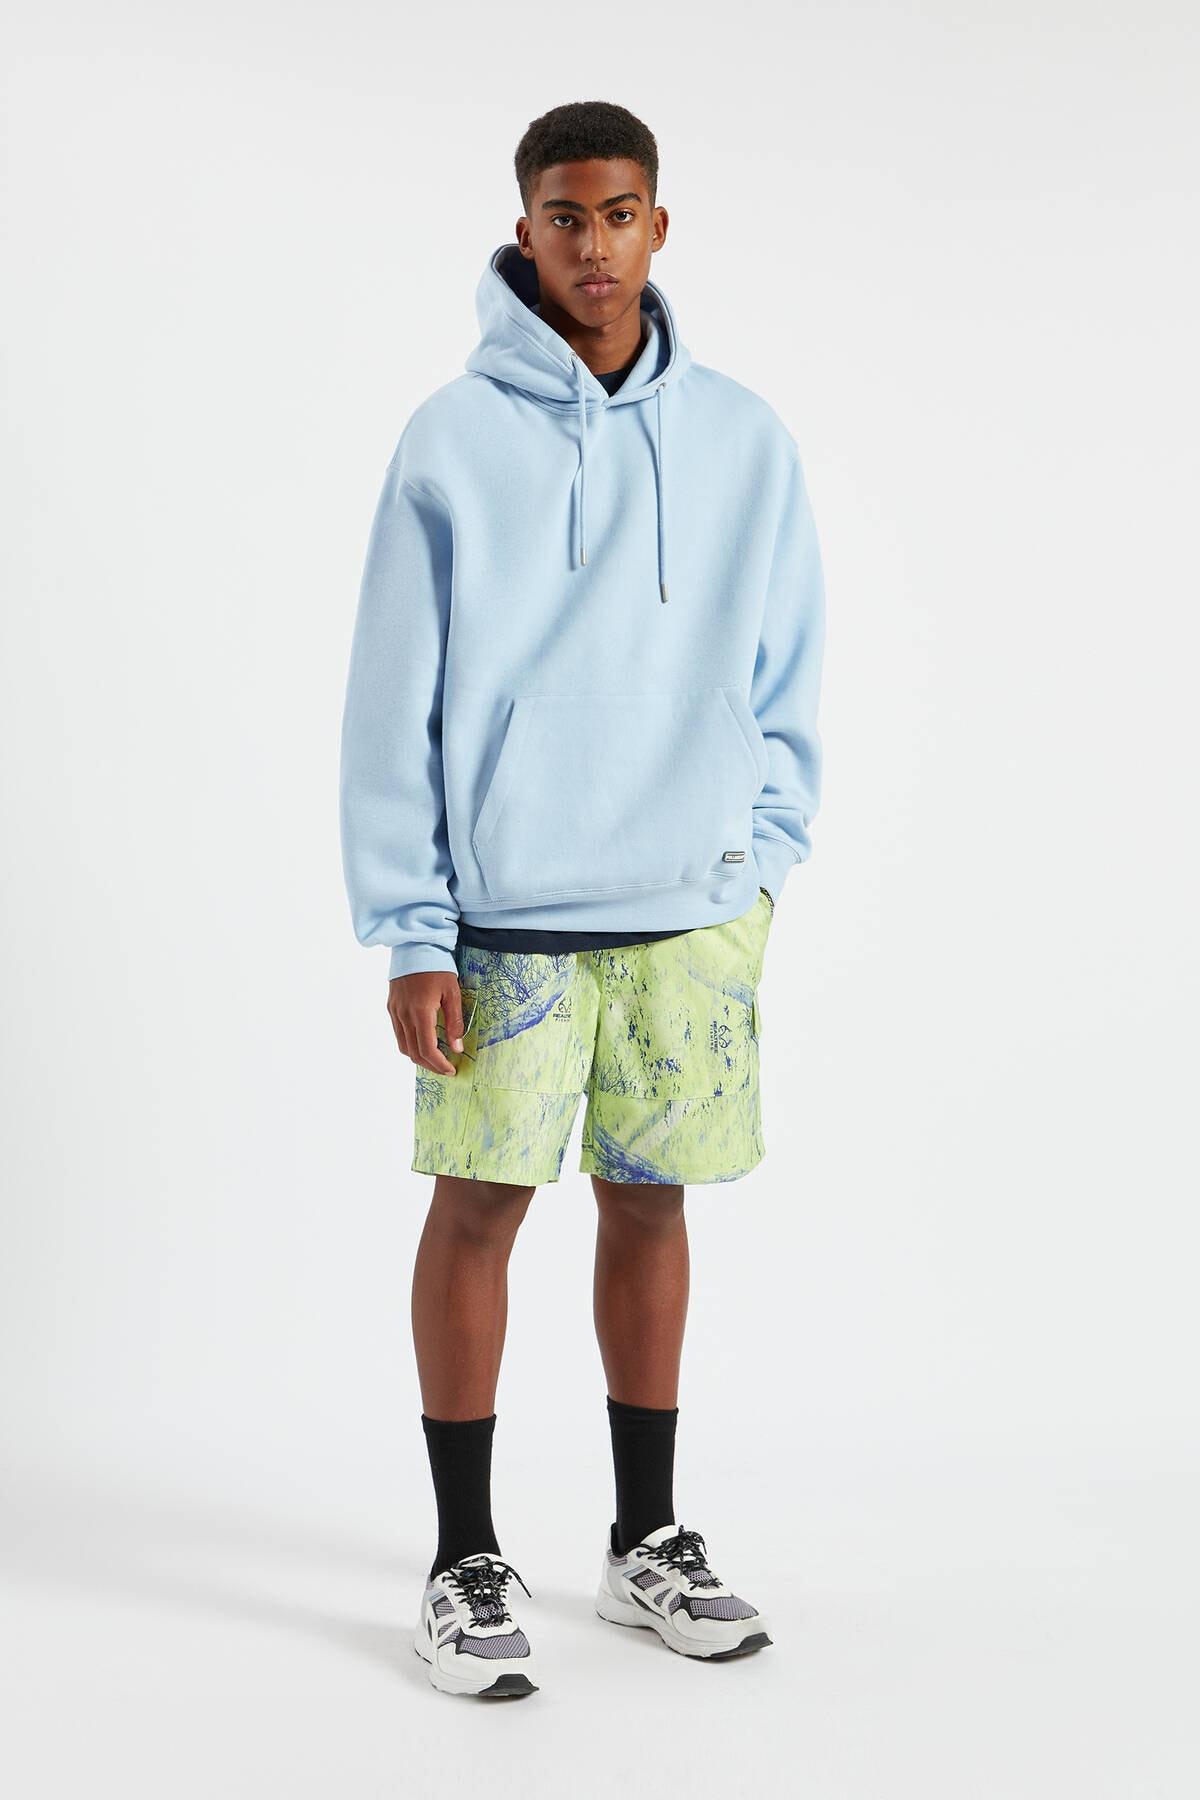 Pull & Bear Erkek Gök Mavisi Kapüşonlu Kanguru Cepli Basic Sweatshirt 09594513 1